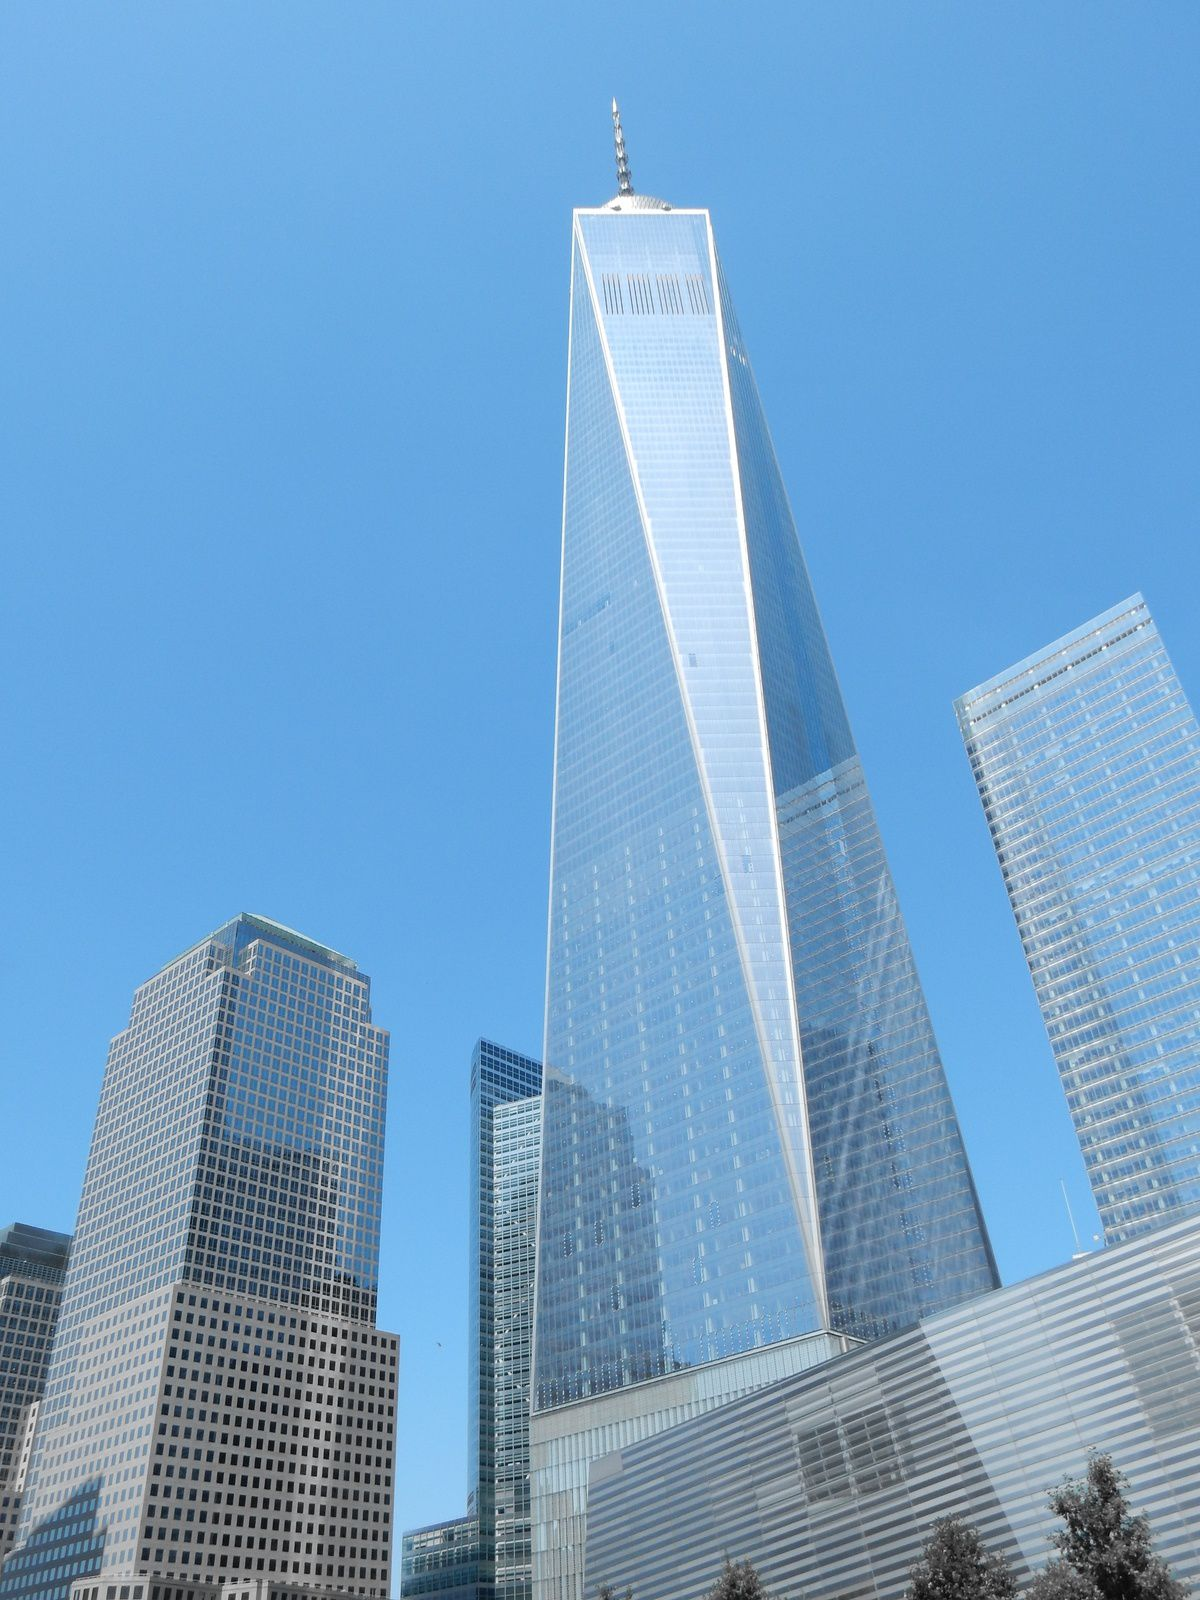 Buildings, New-York, USA - Août 2014